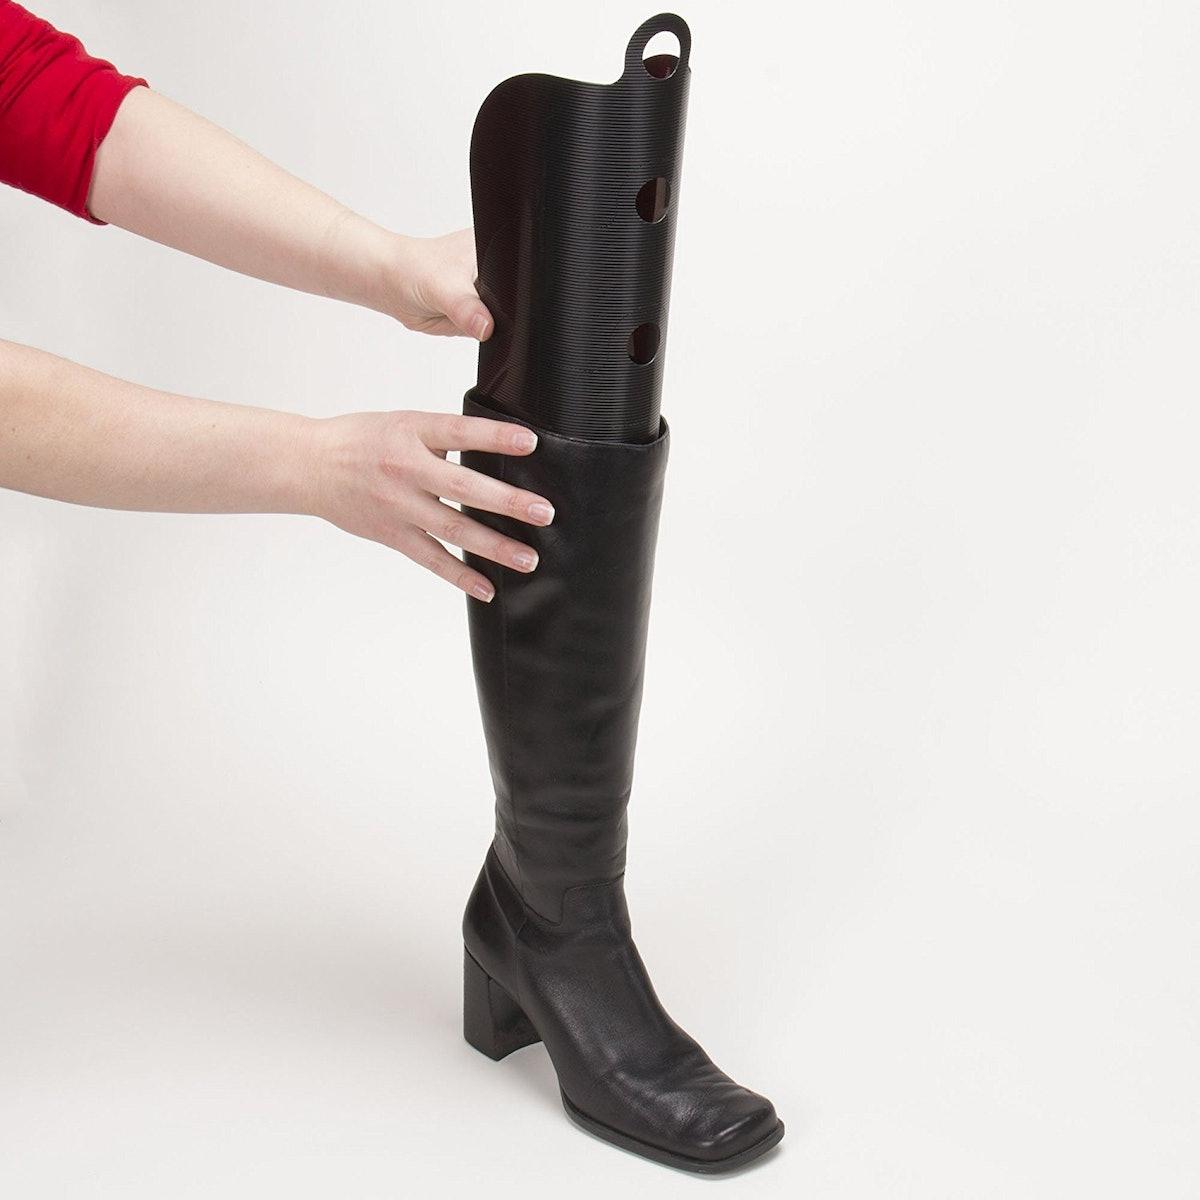 Household Essentials Cedar Fresh Boot Shapers (4 Pairs)